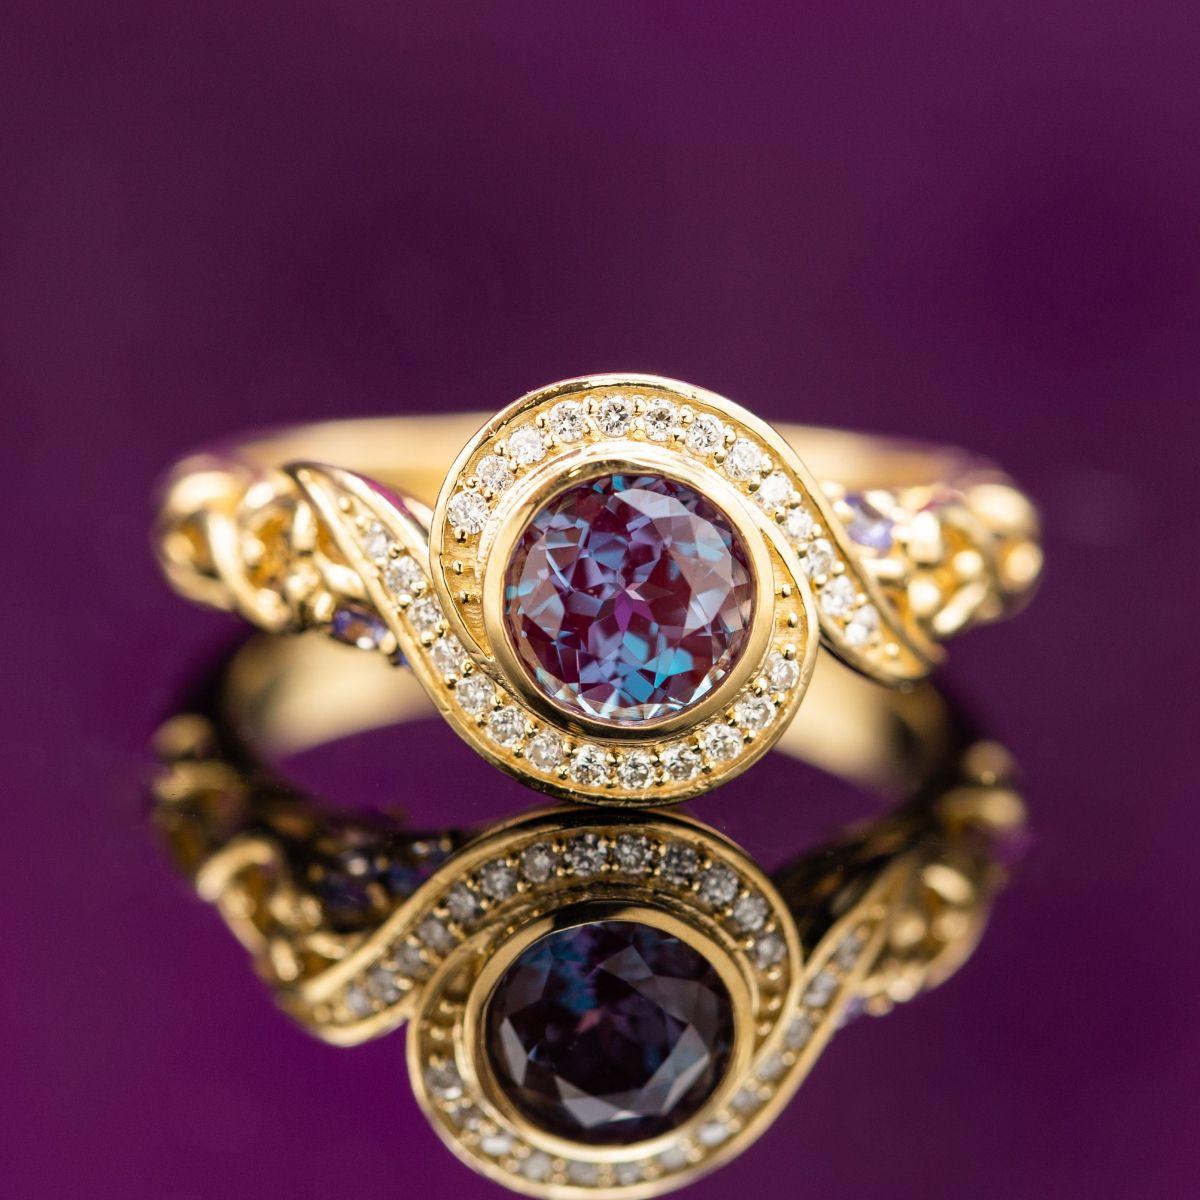 alexandrite engagement rings. Black Bedroom Furniture Sets. Home Design Ideas